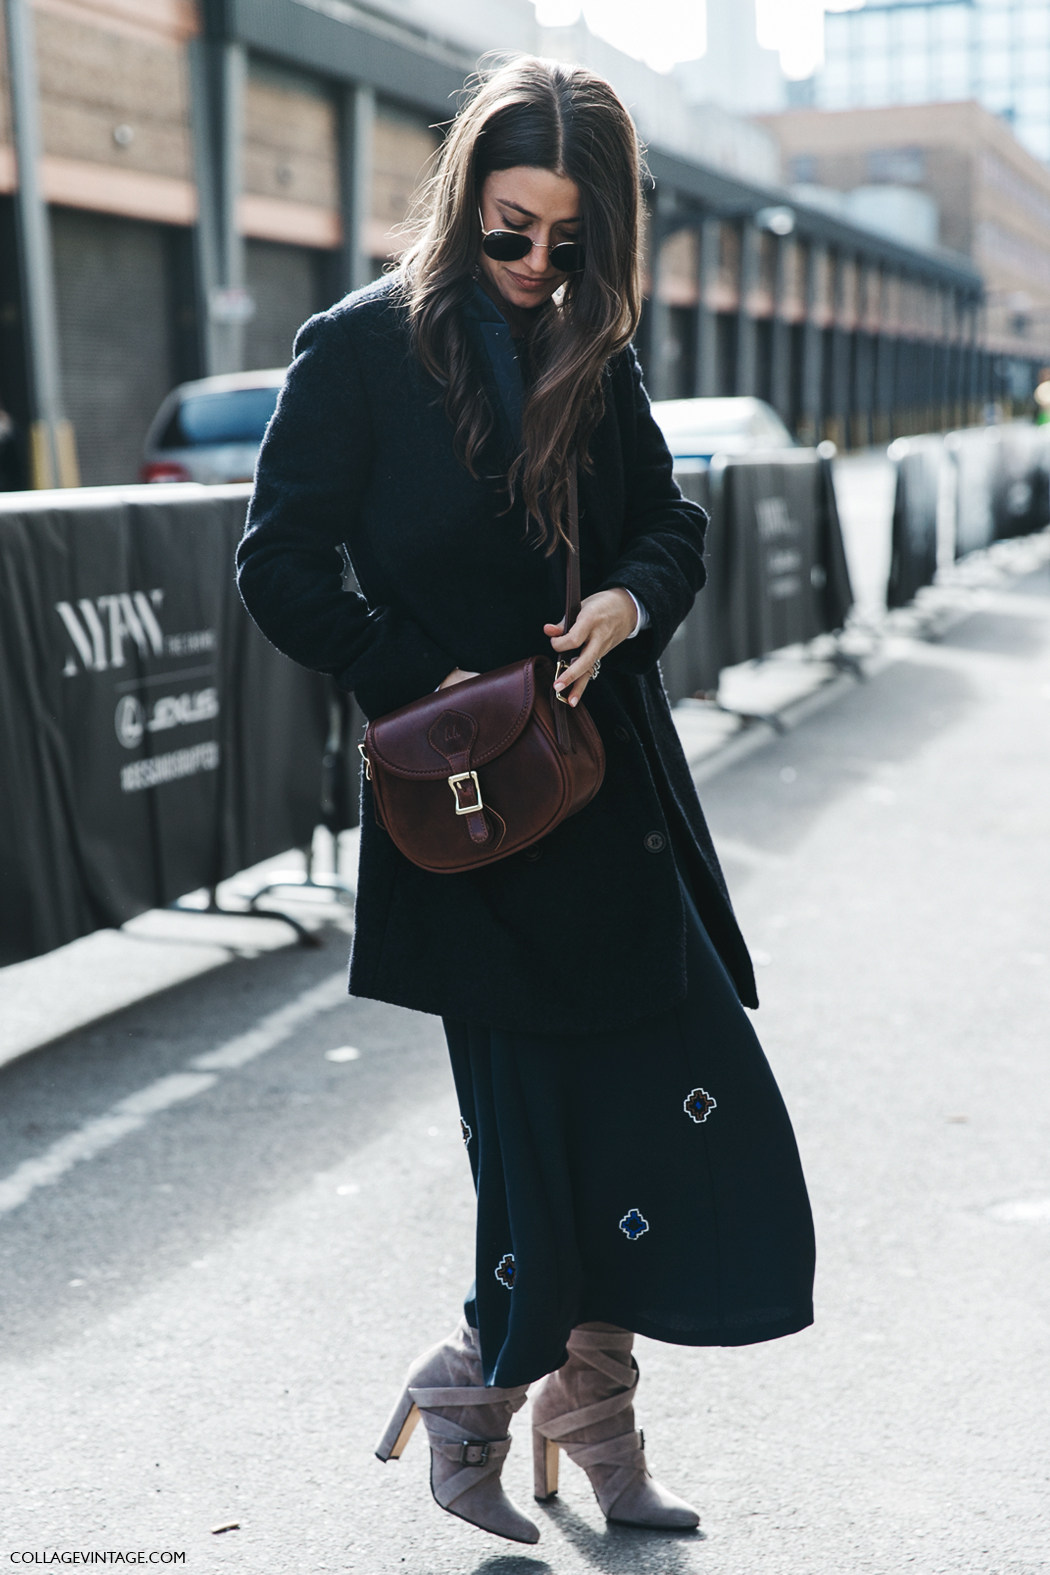 NYFW-New_York_Fashion_Week-Fall_Winter-17-Street_Style-Amanda_Weiner-